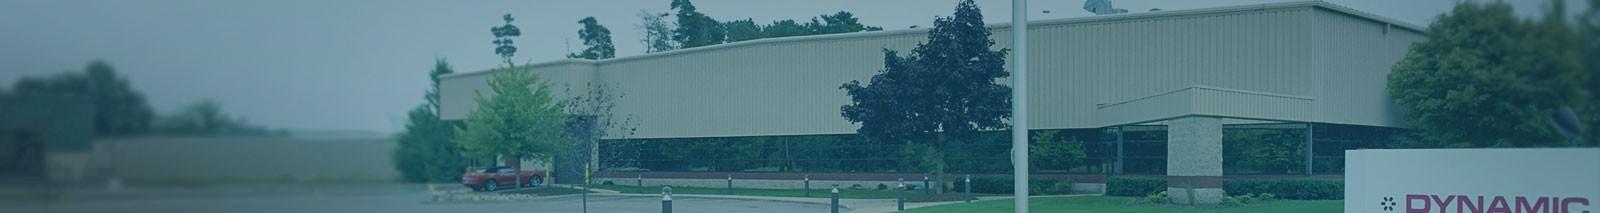 Dynamic Conveyor Corporate Headquarters